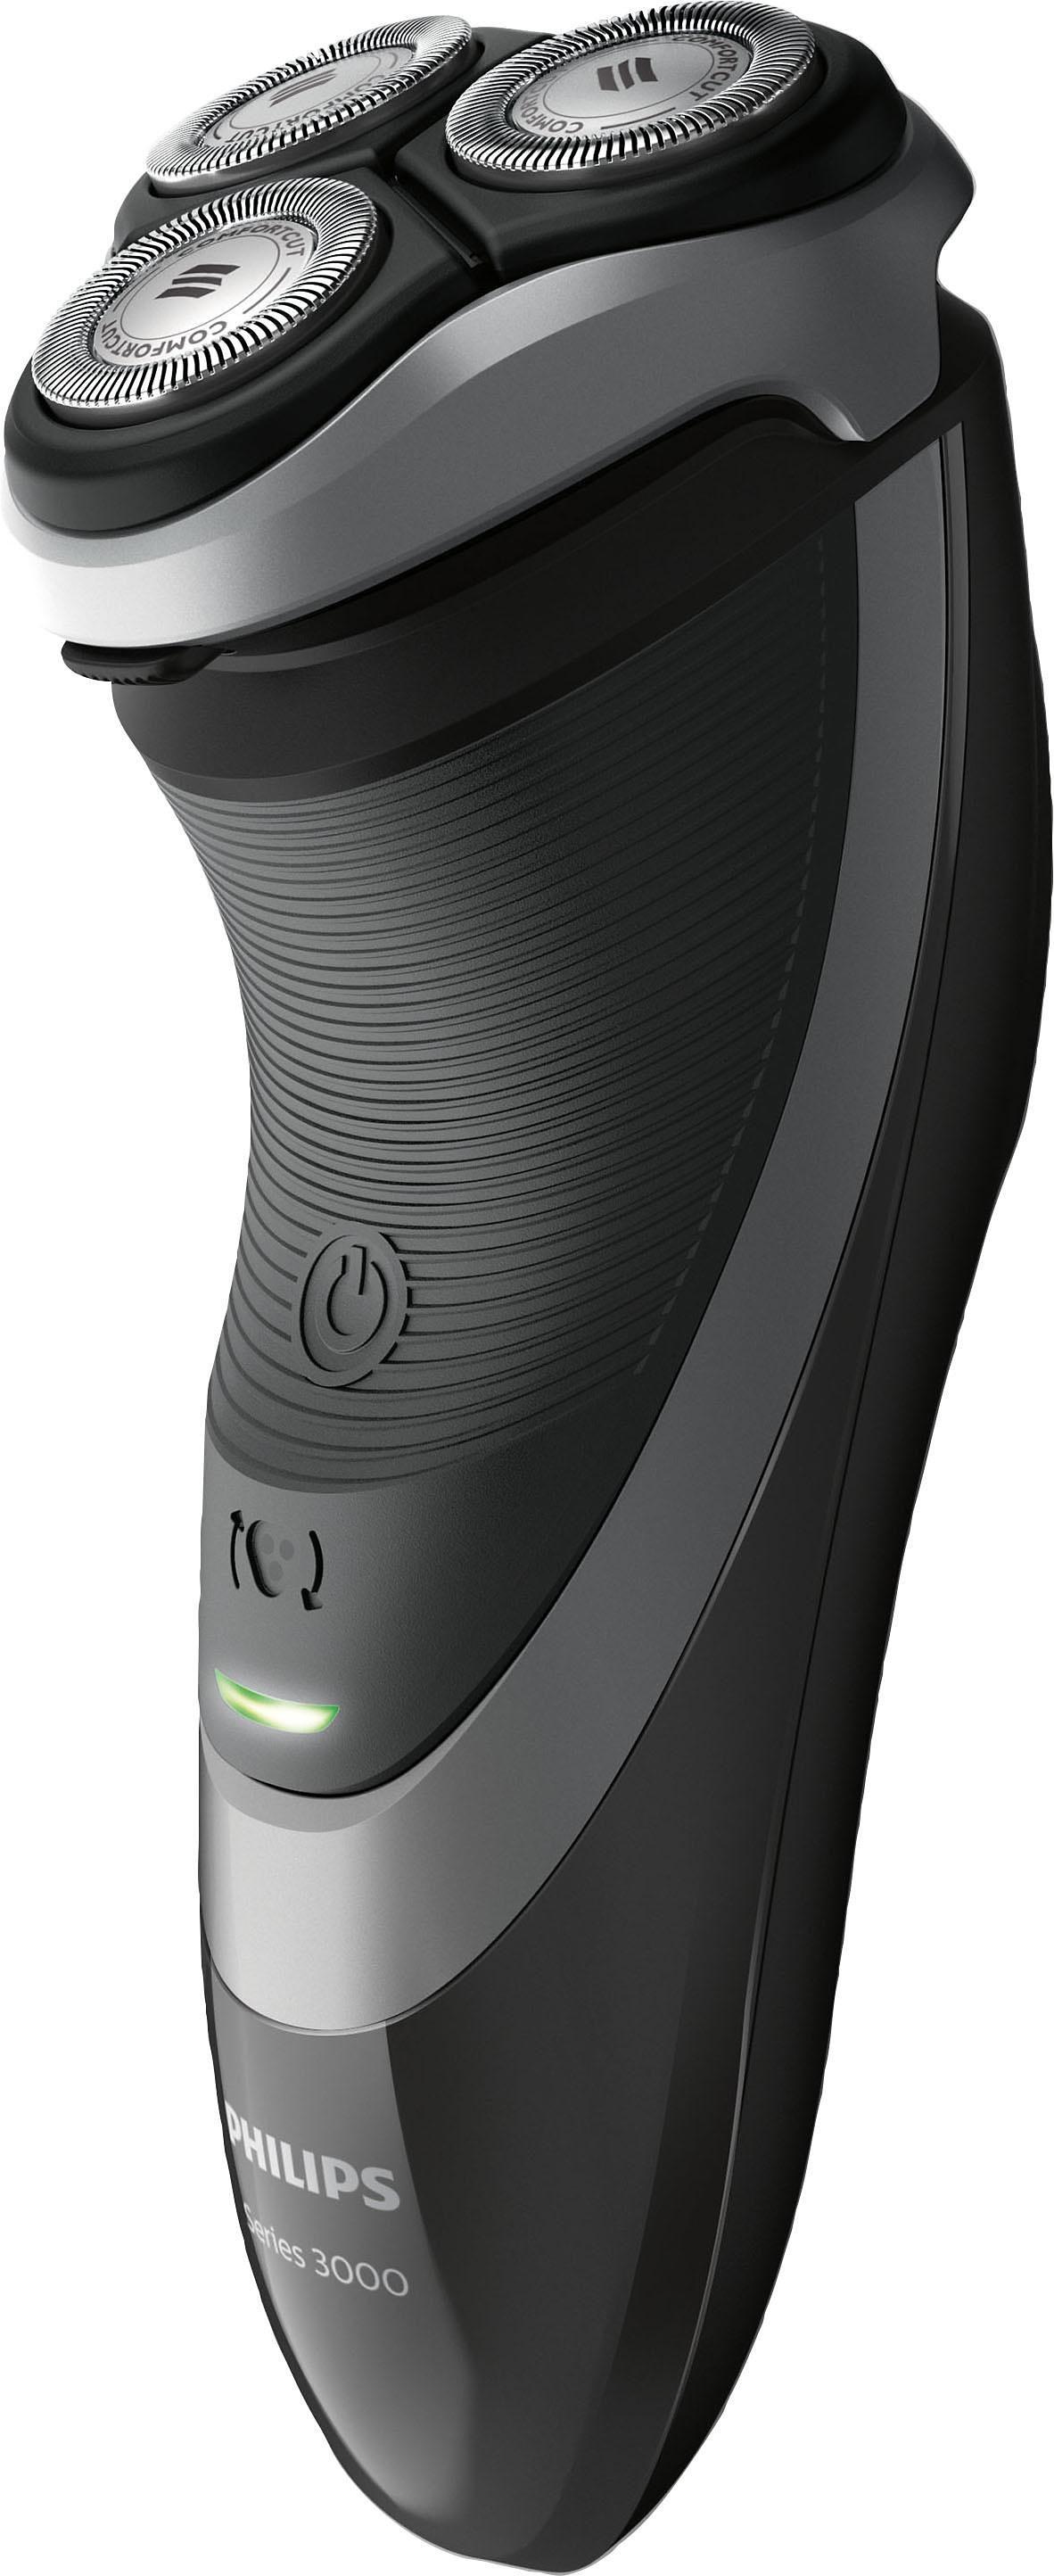 Philips Rasierer Series 3000 S3510/06, Akku/Netz, KomfortCut, schwarz-silber